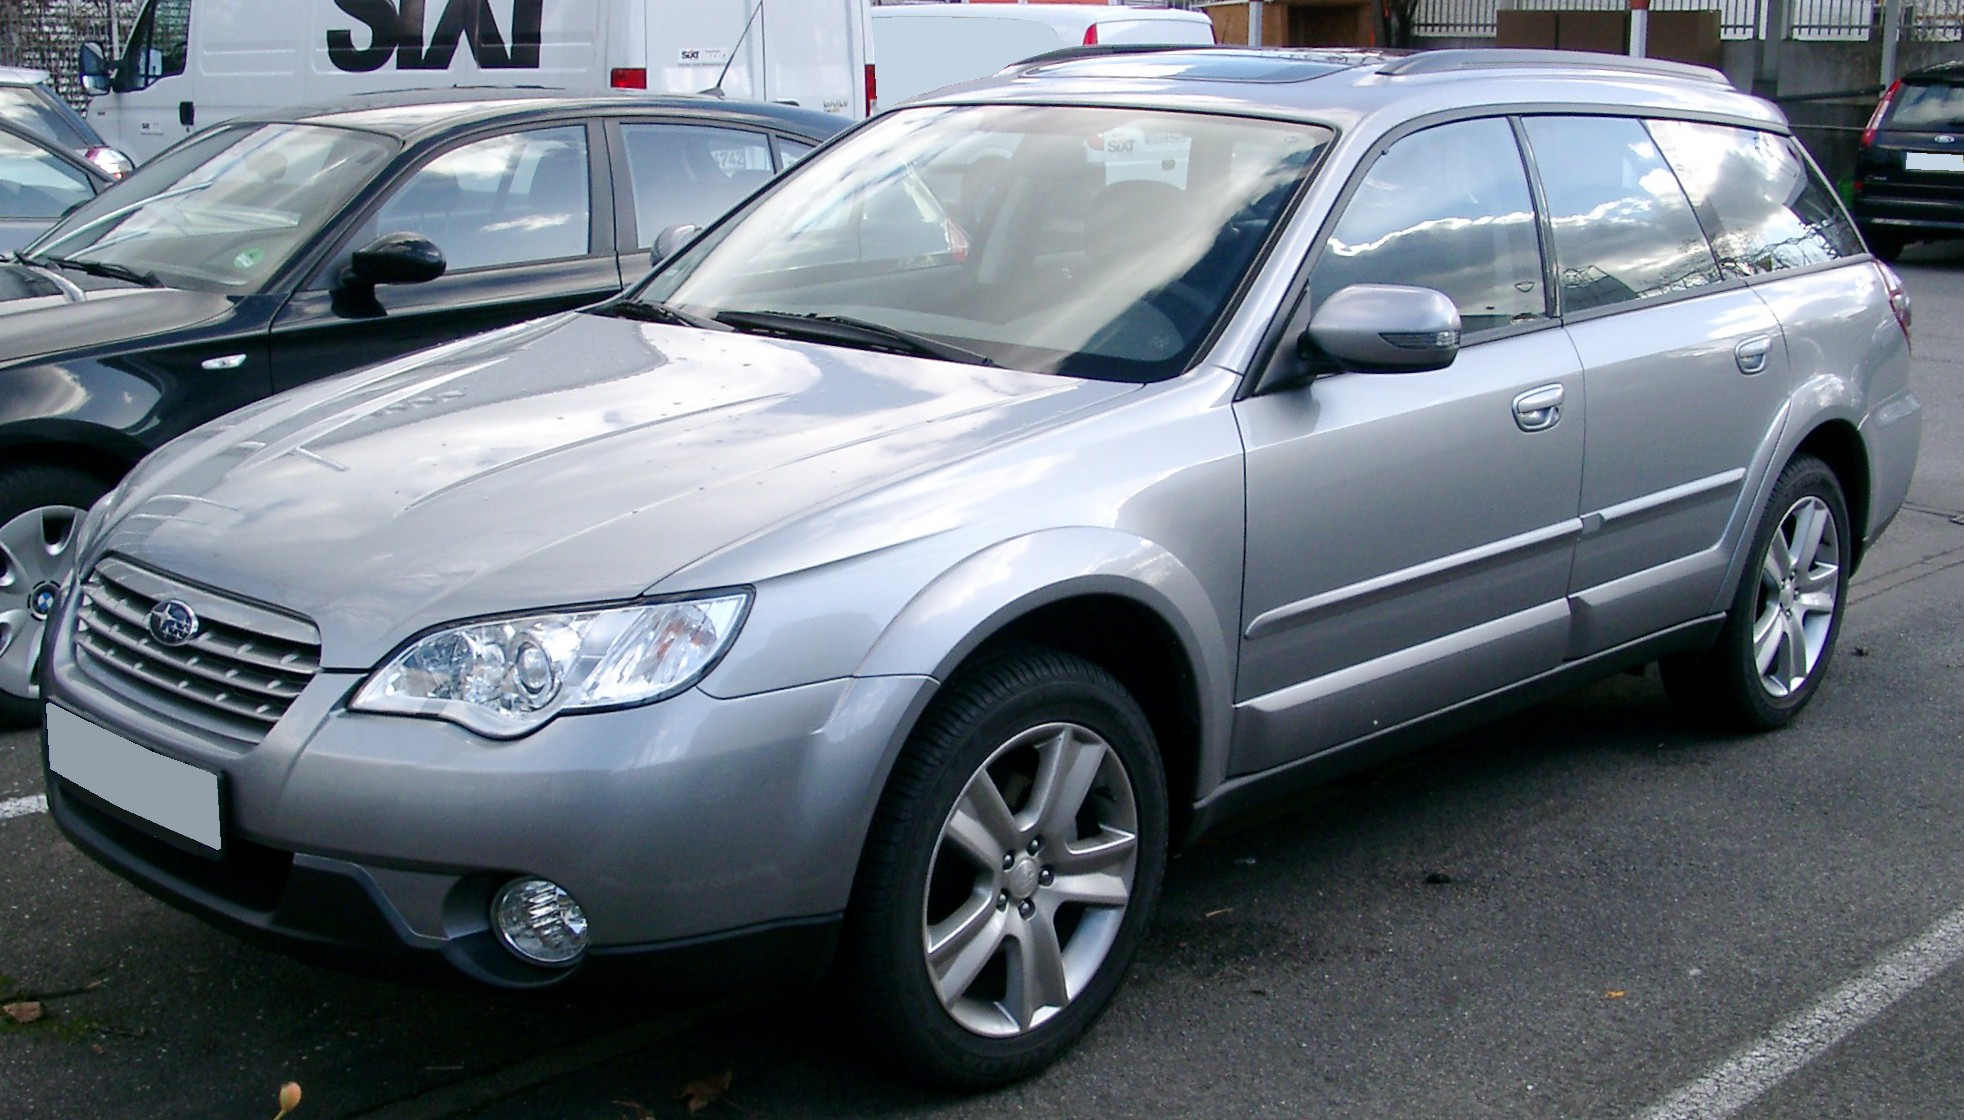 File Subaru Outback Front 20080202 Jpg Wikimedia Commons